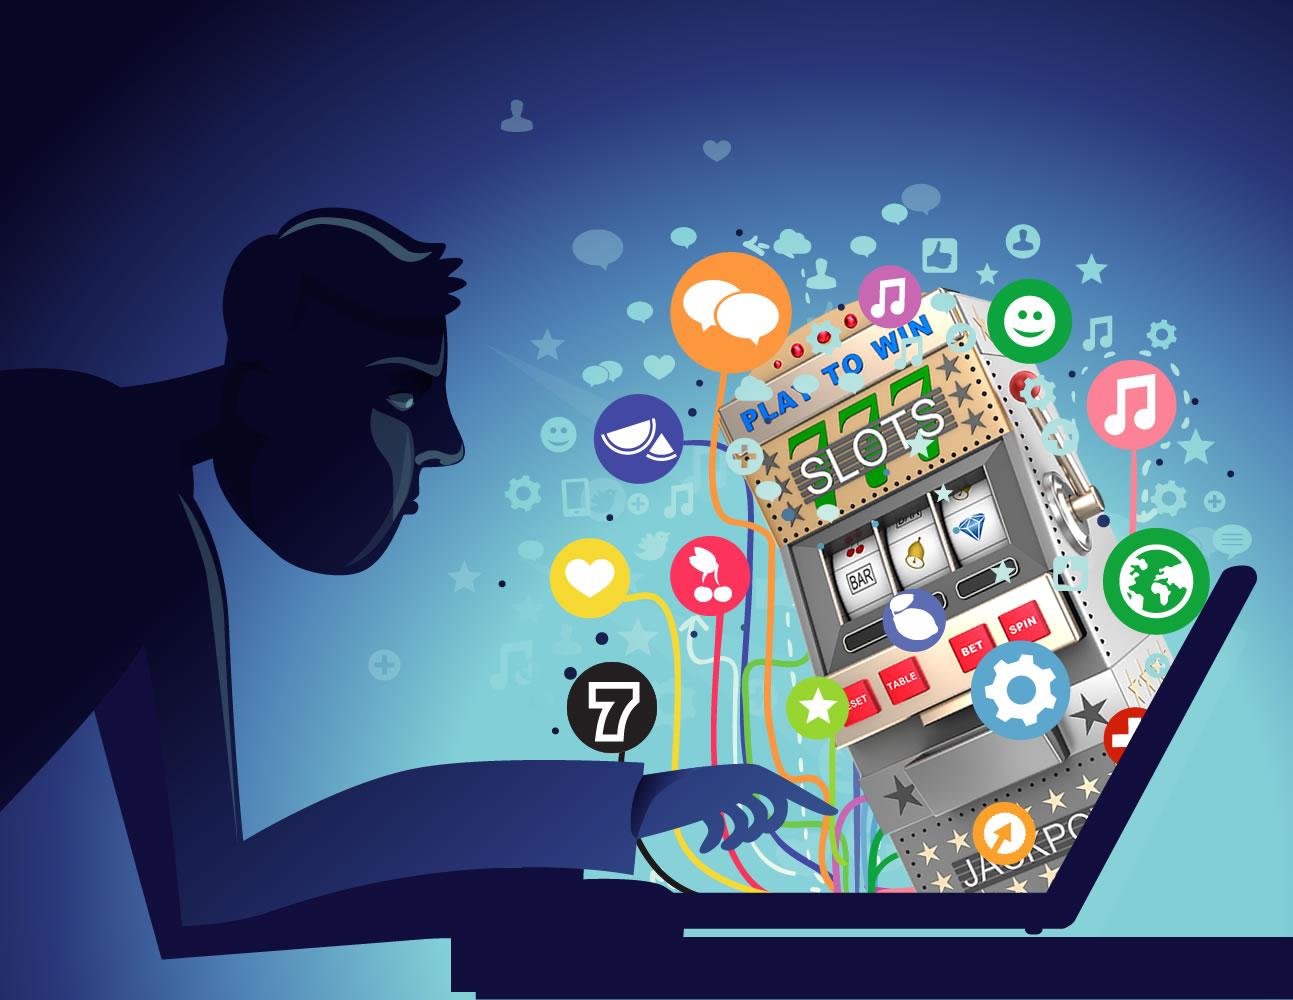 Ludopatia prevencion vulkanBet casino online-87005